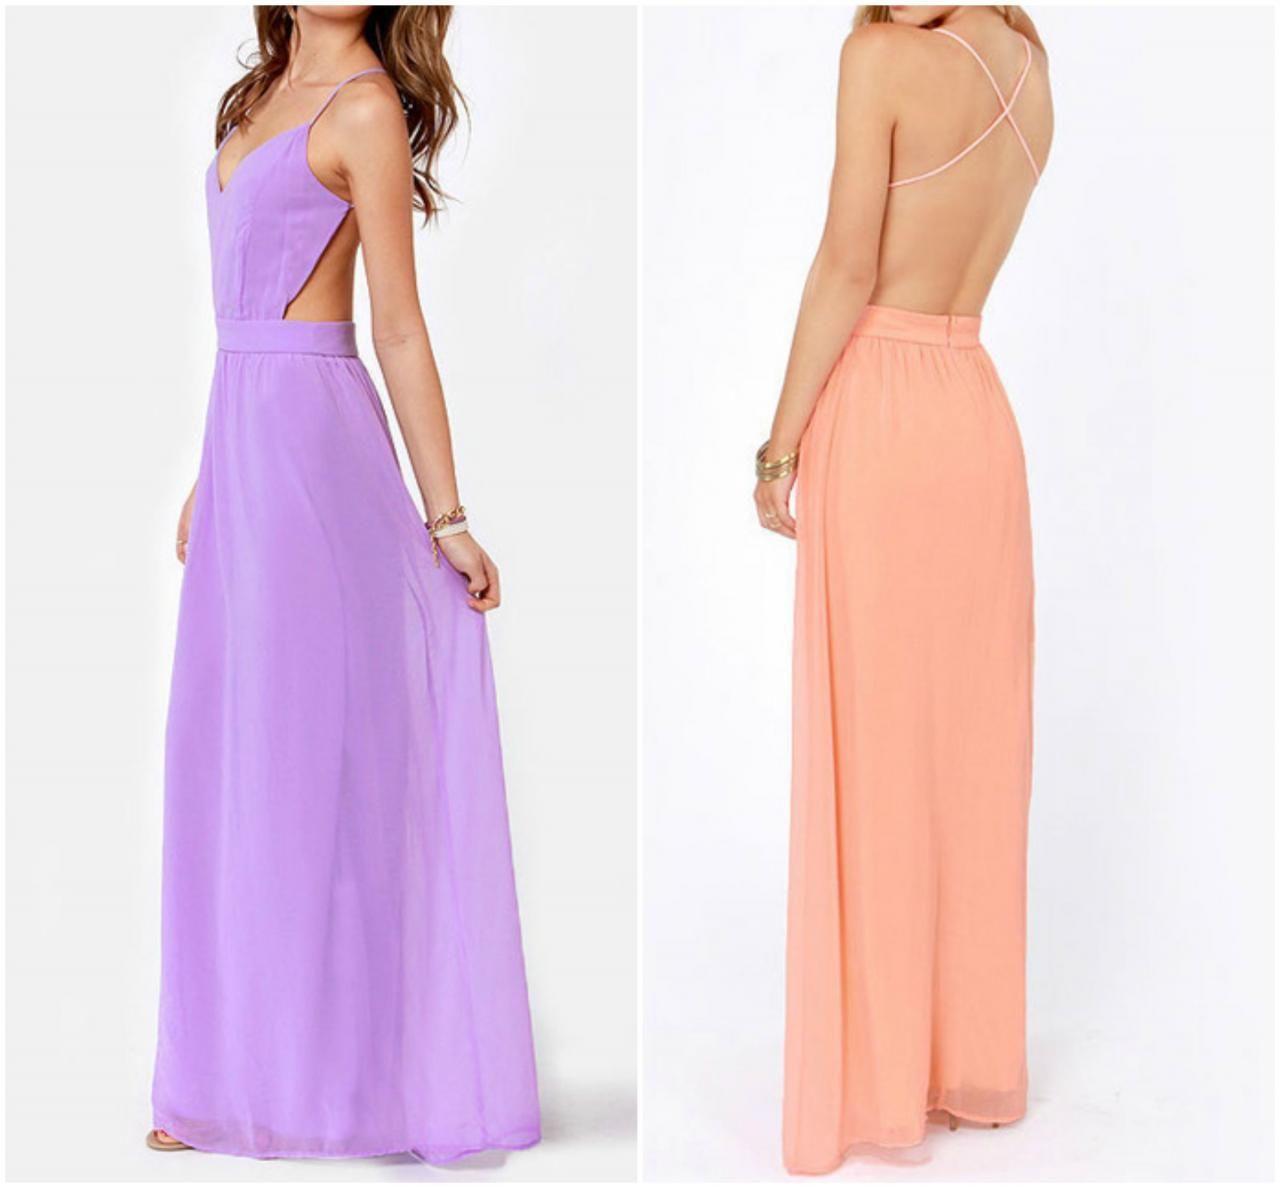 Elegant cross back spaghetti strap in pink and dress in